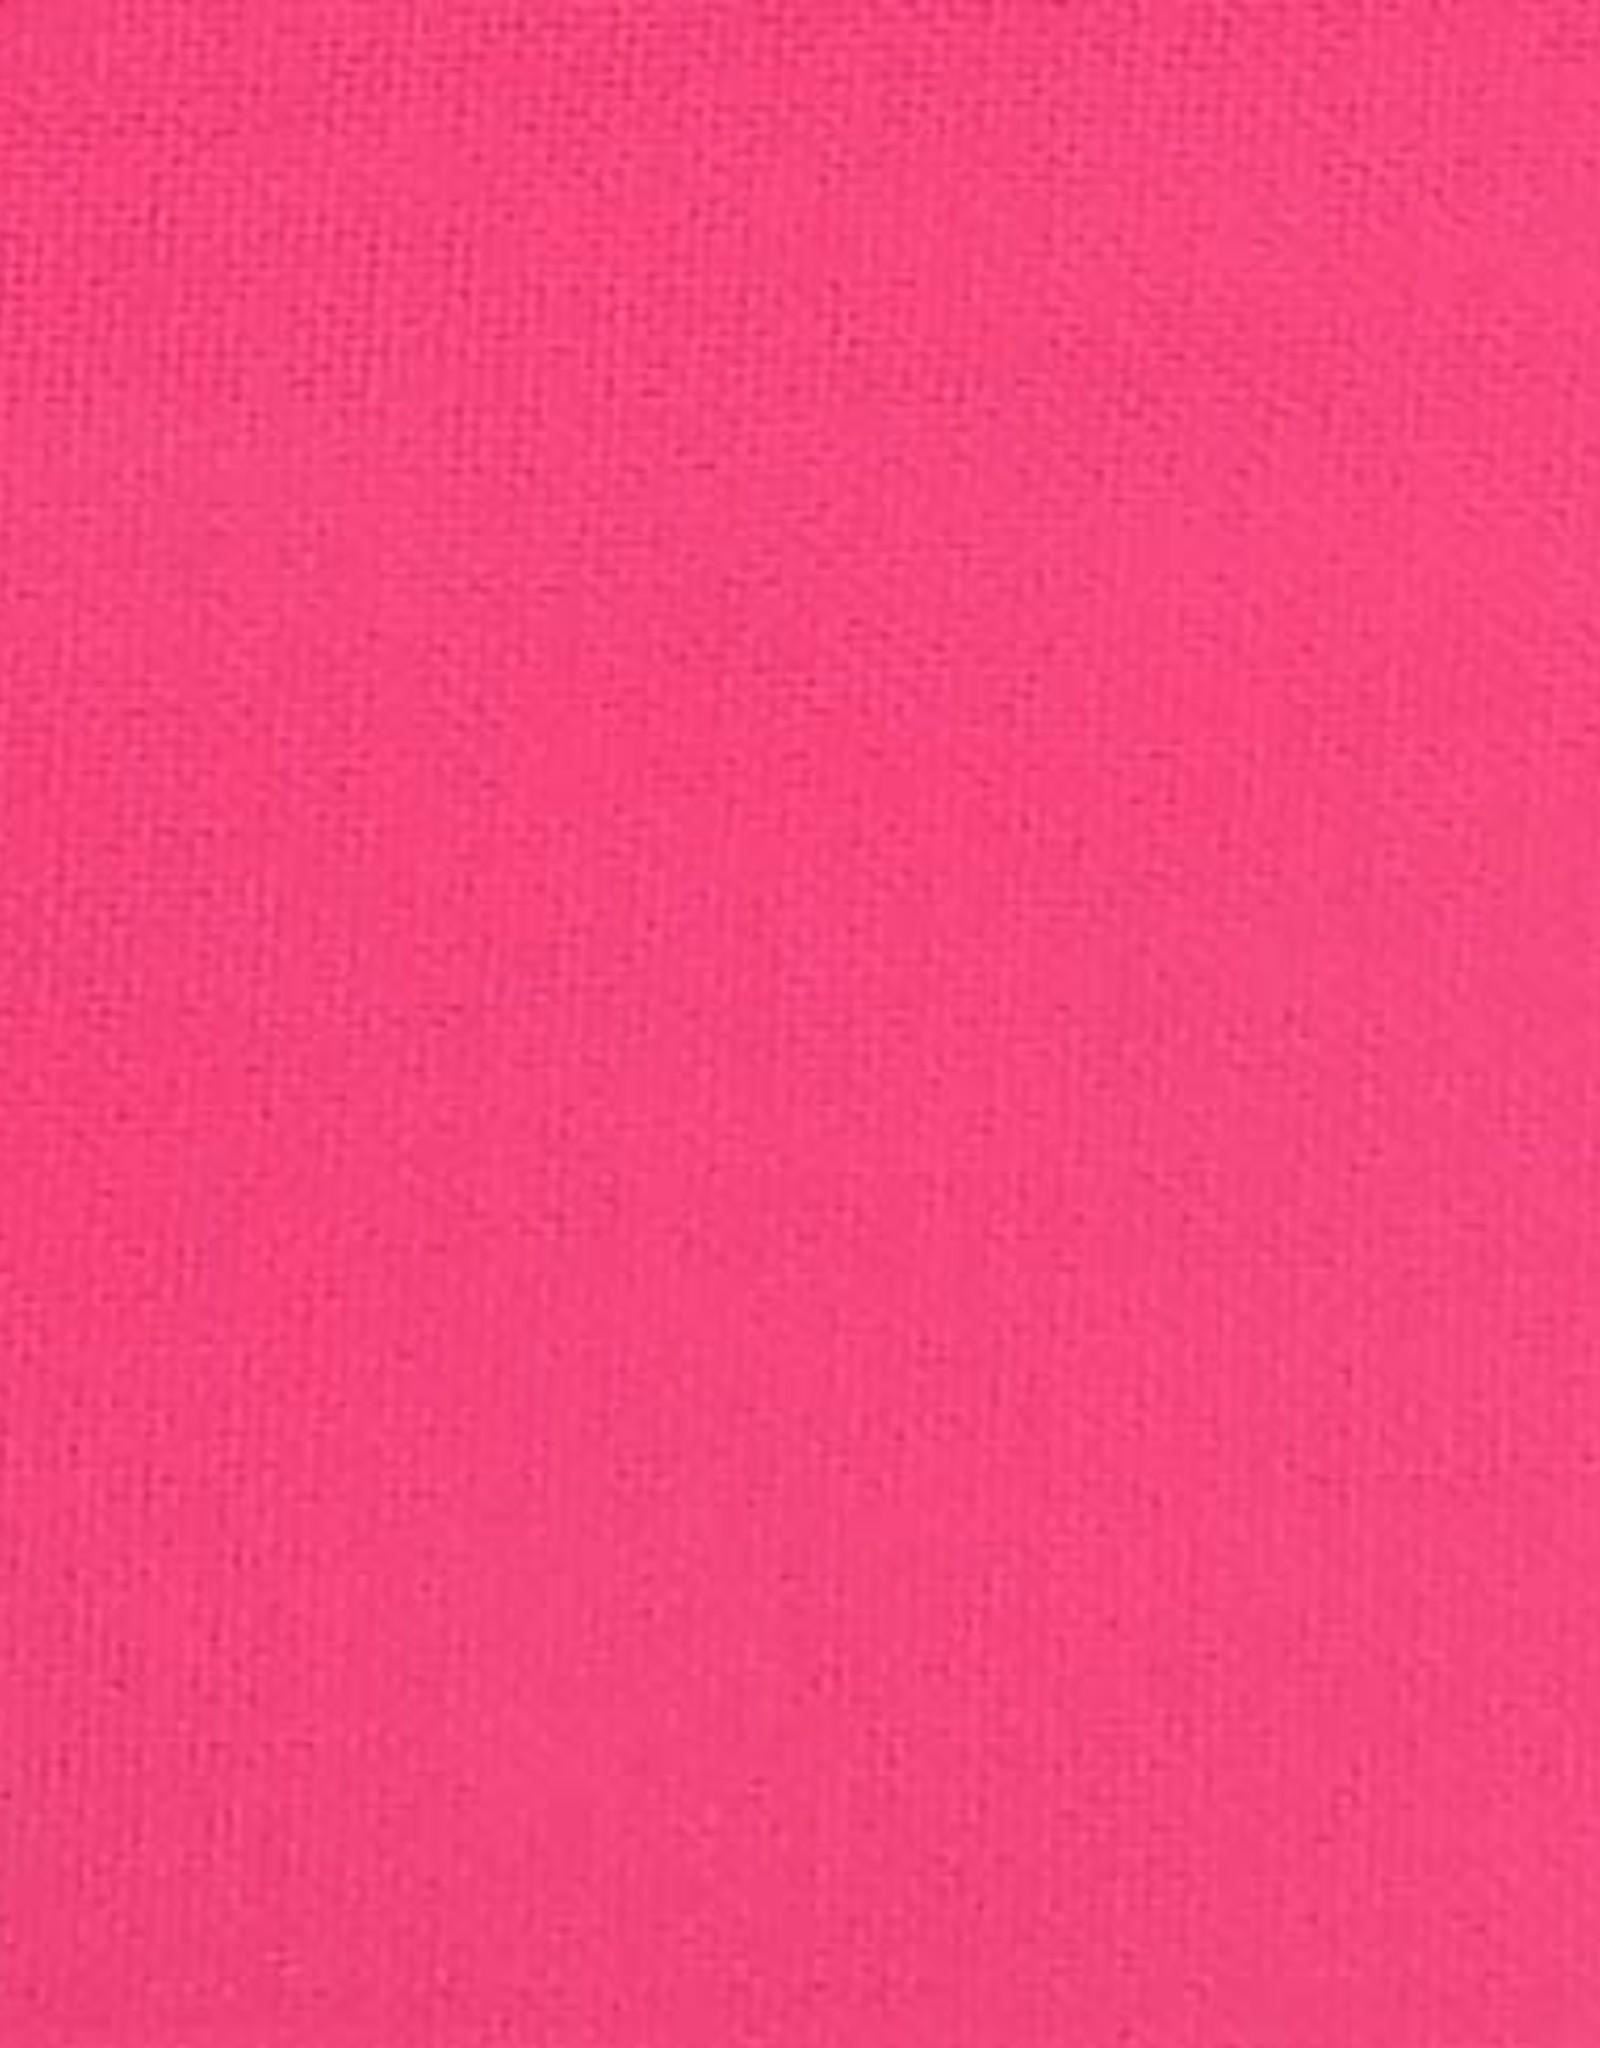 Chiffon 58 - 60 Inches Bright Pink (Yard)